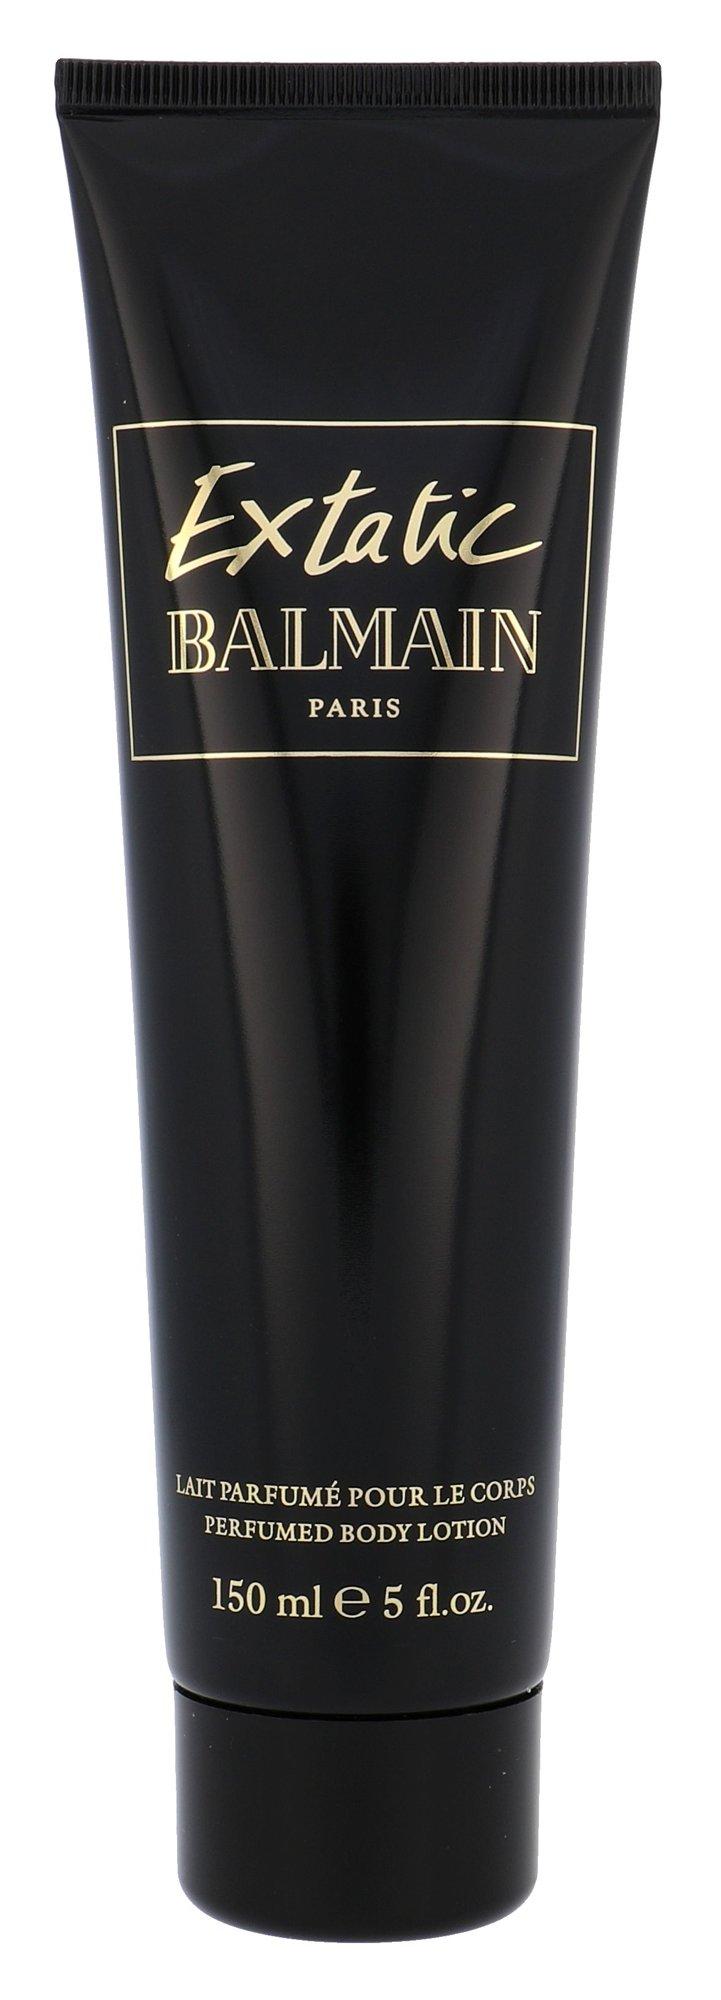 Balmain Extatic Body lotion 150ml